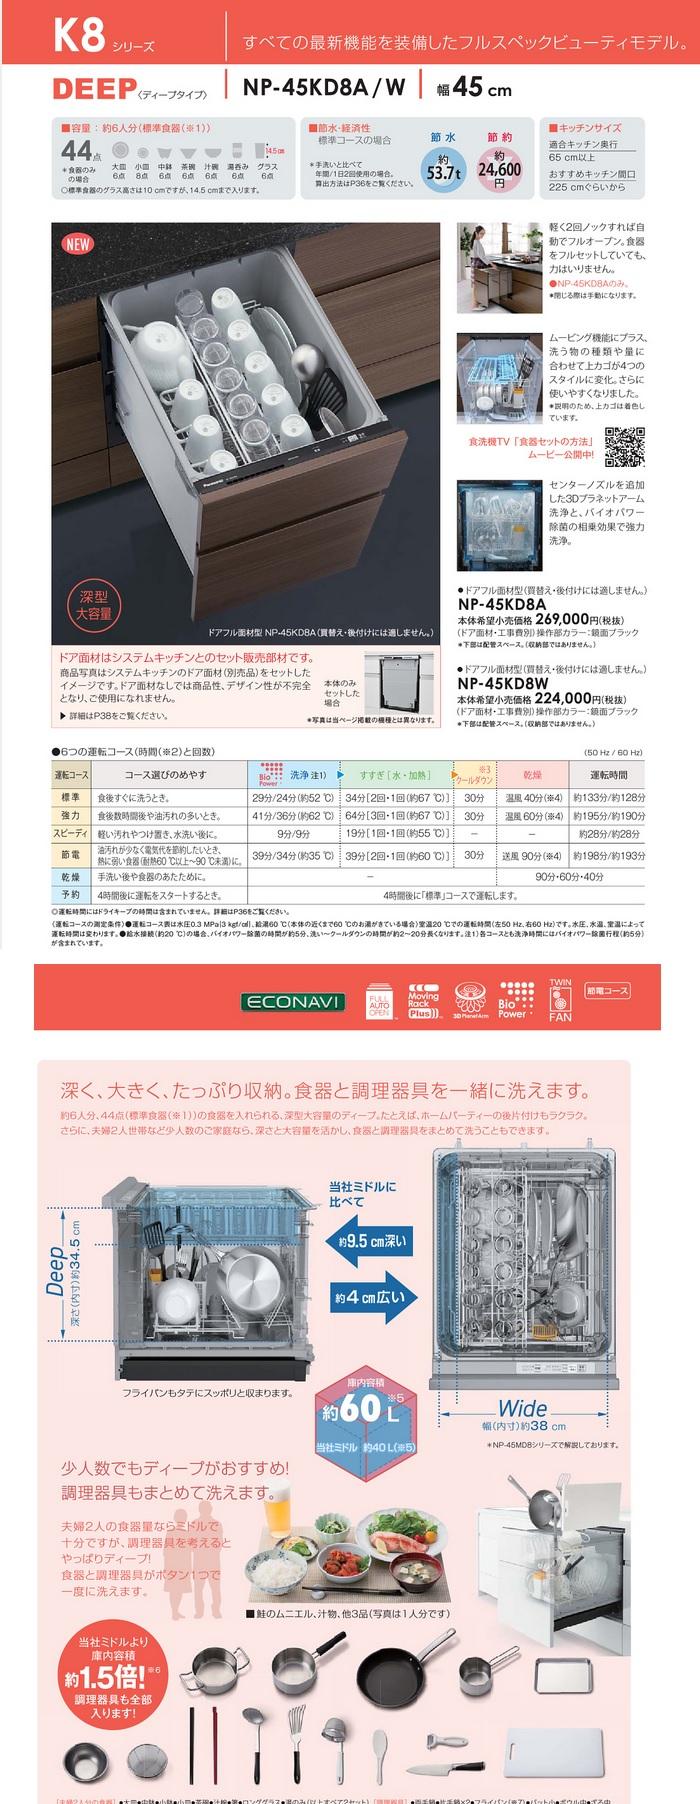 K8ディープ商品説明